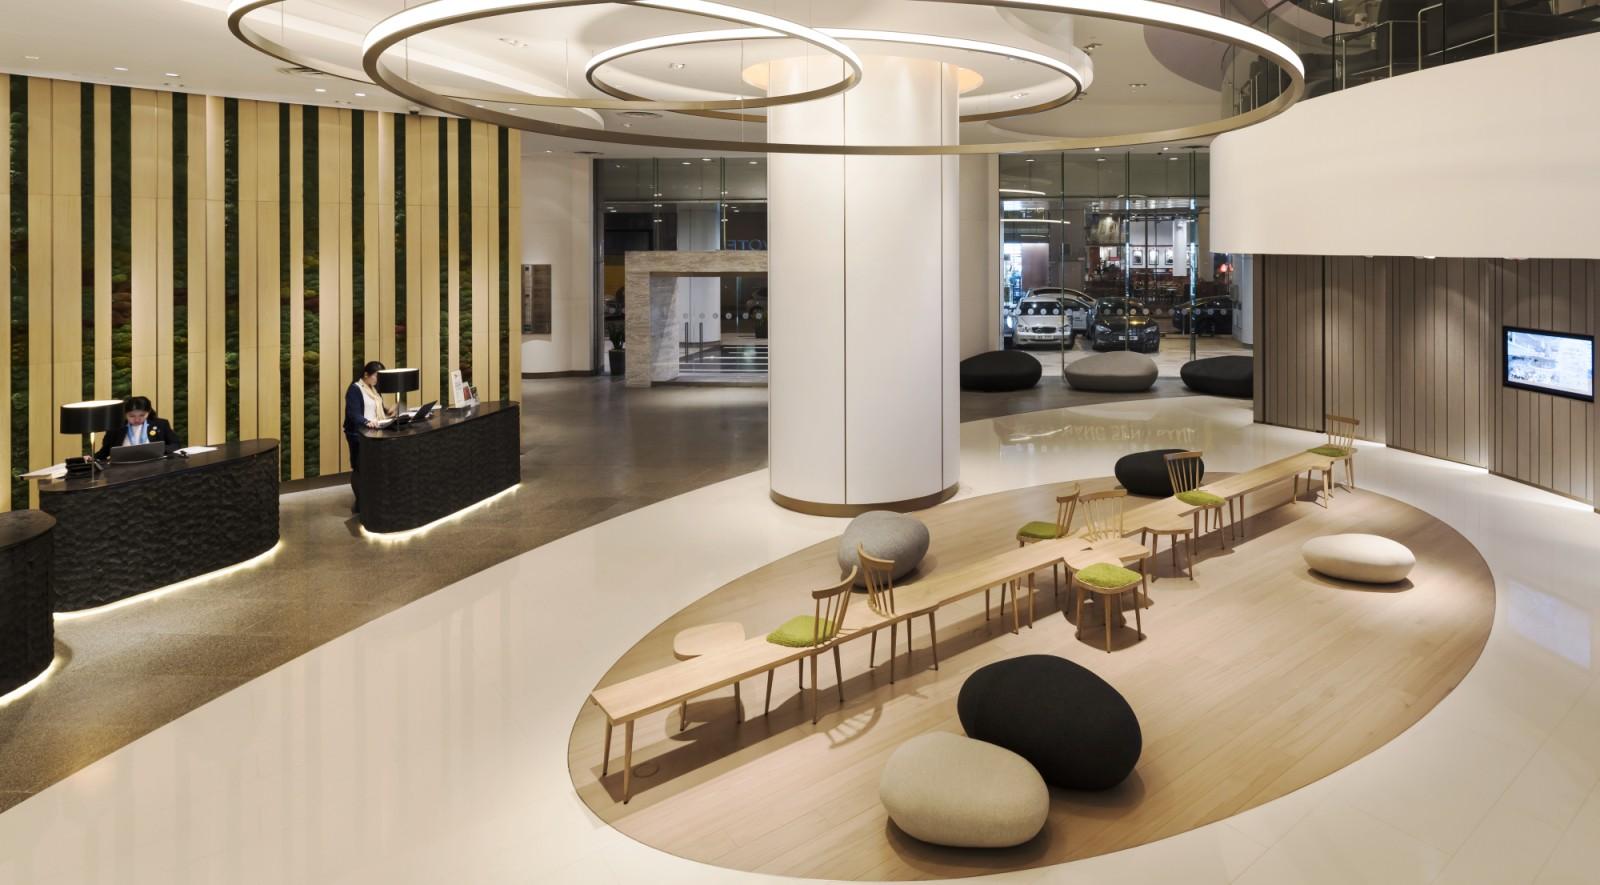 Novotel Century Hong Kong Lobby Area By Aedas Interiors